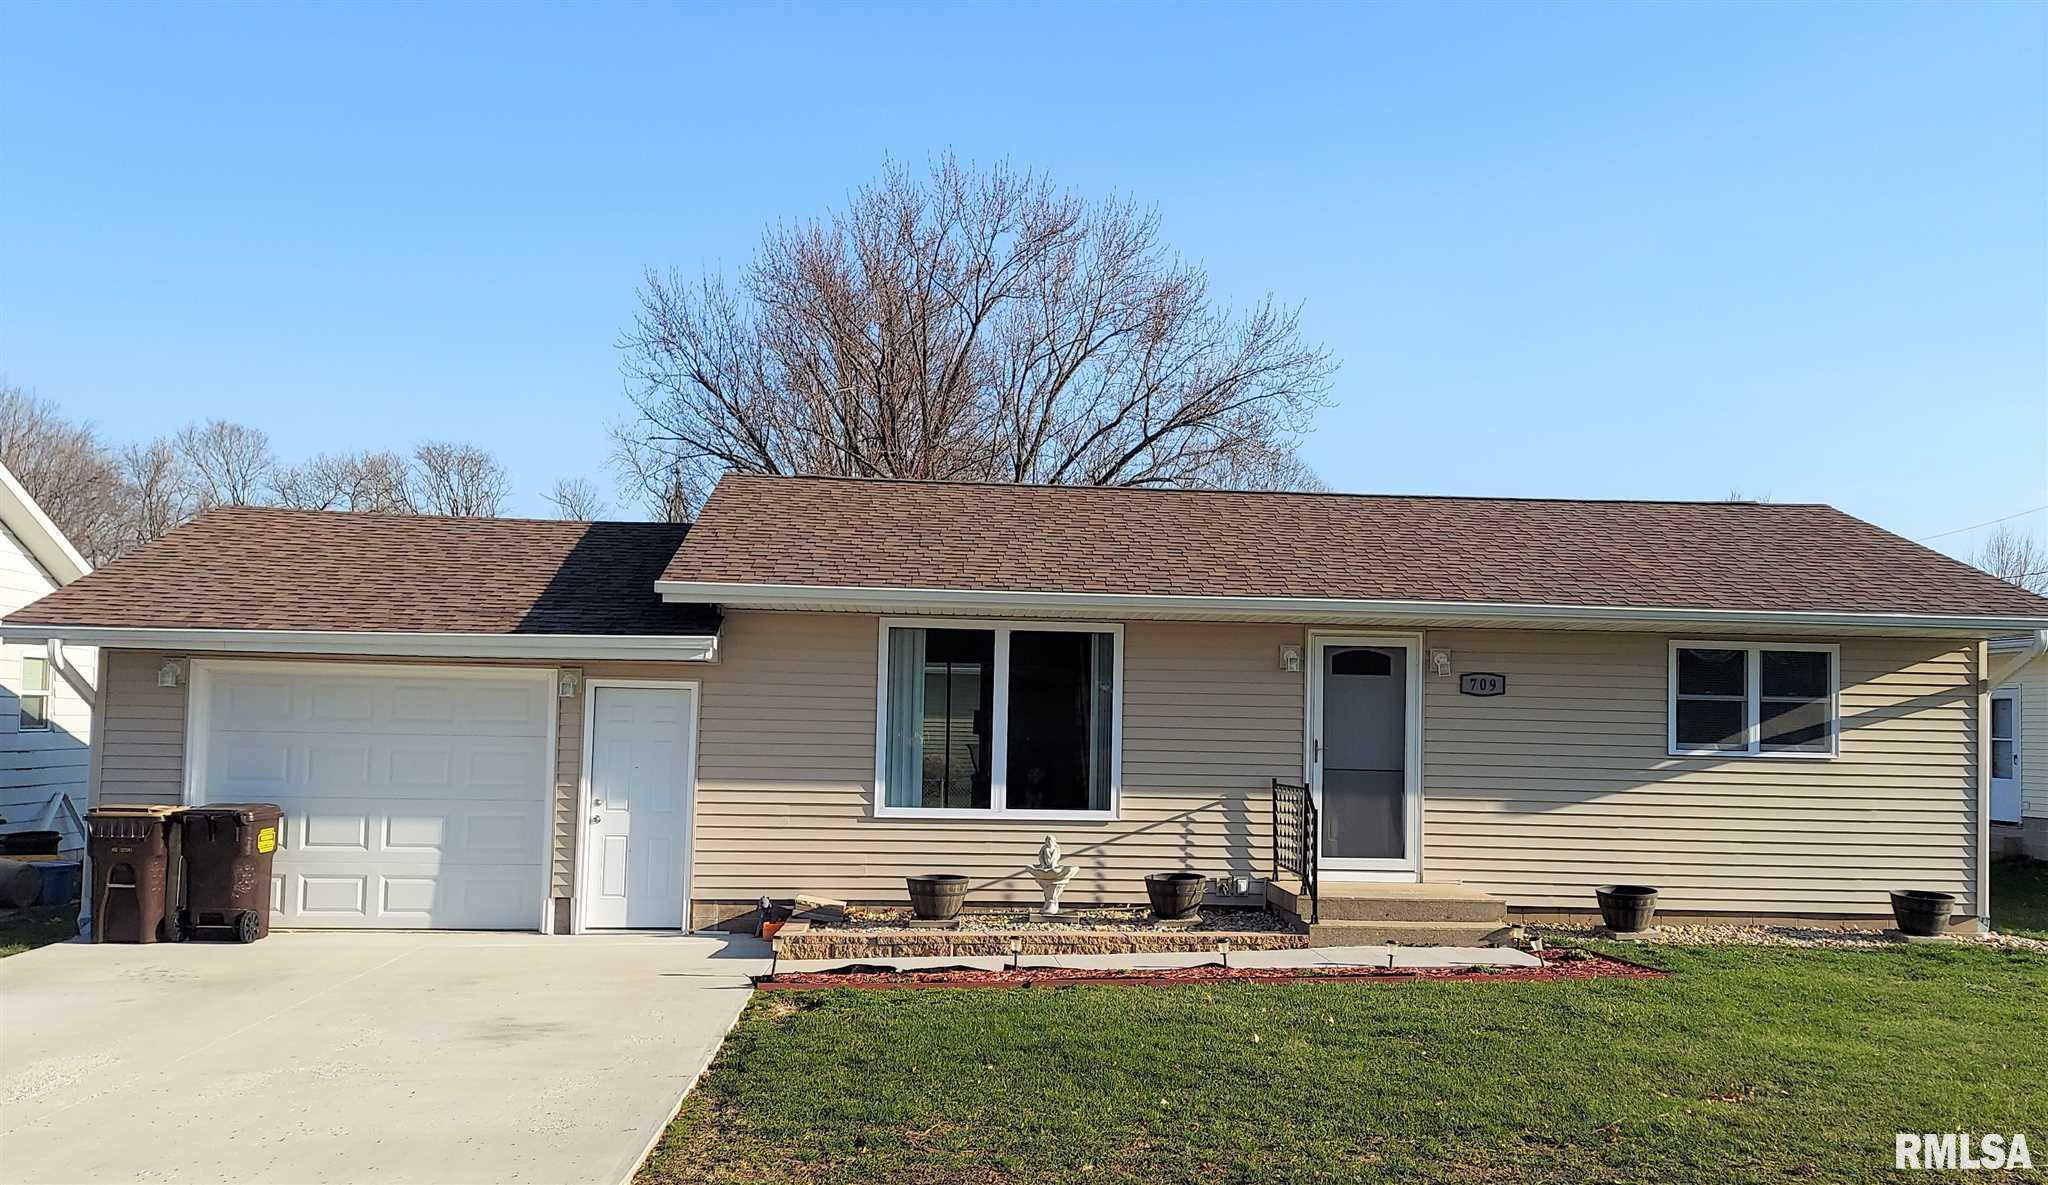 709 FOWLER Property Photo - Fulton, IL real estate listing